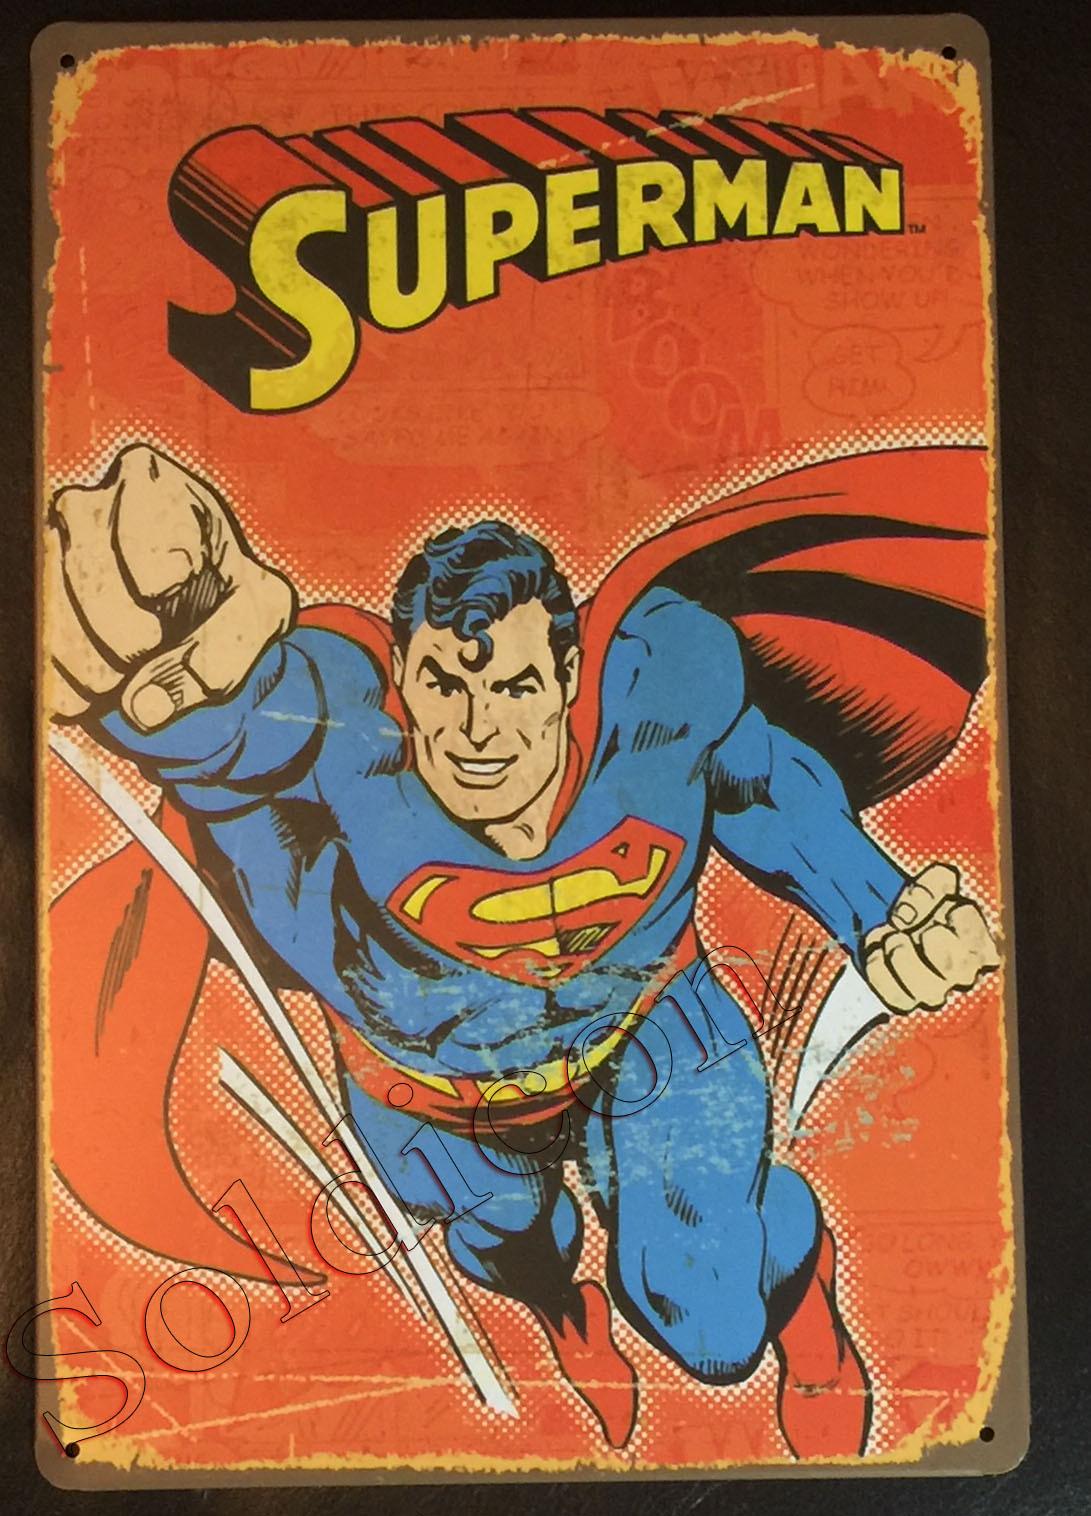 Superman boom